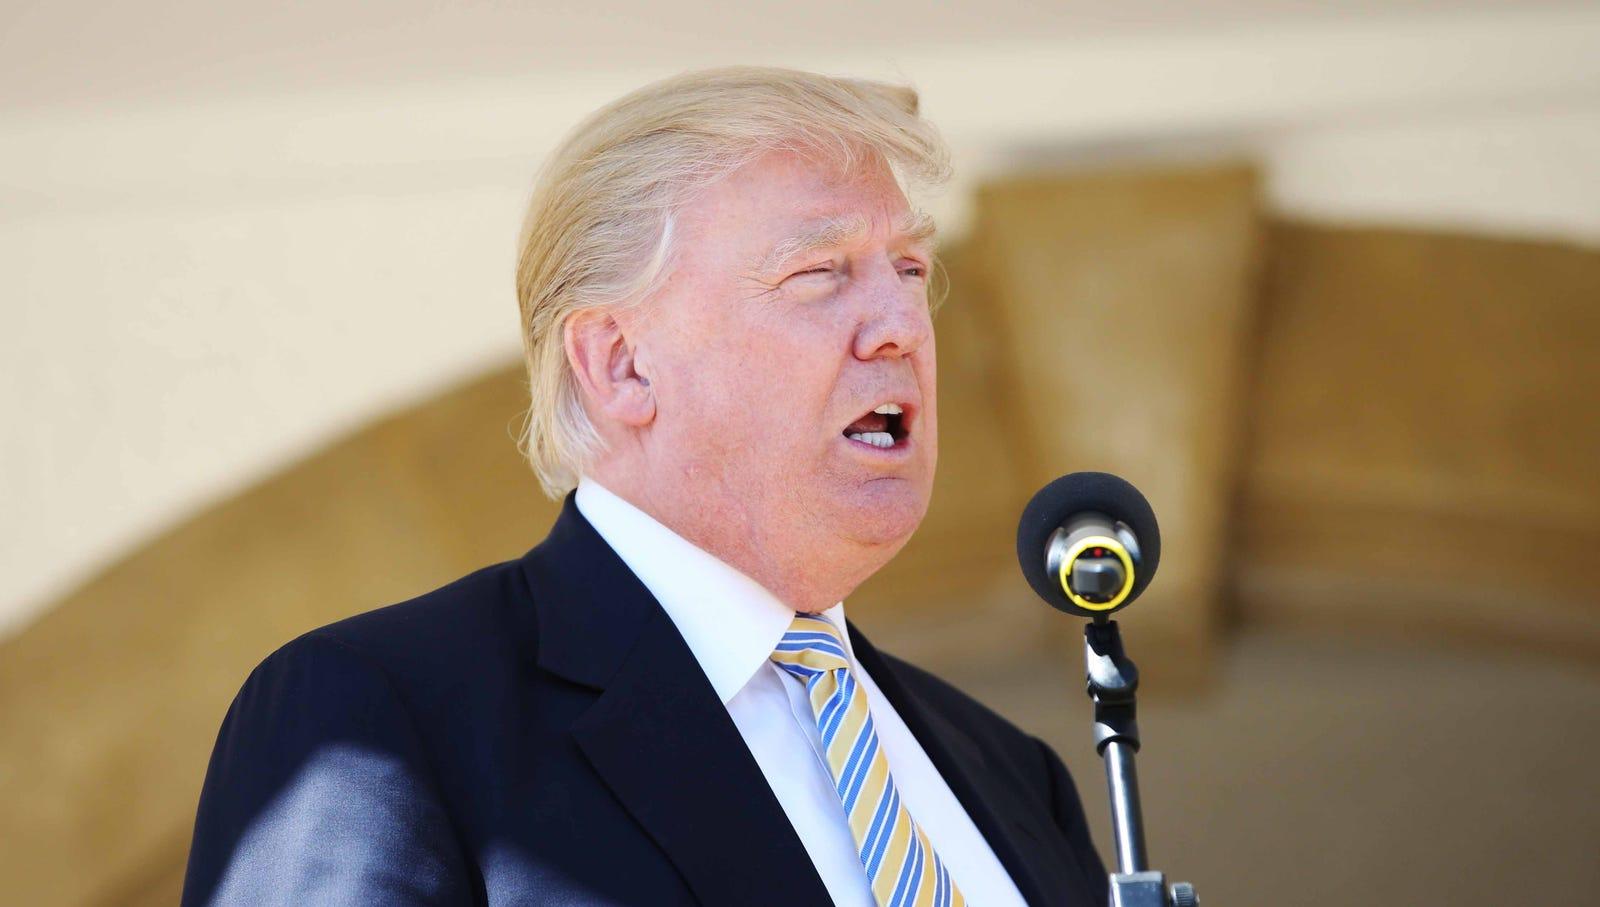 Trump Tells Iowa Dairy Farmers He Has Cows 500 Times Bigger Than Theirs